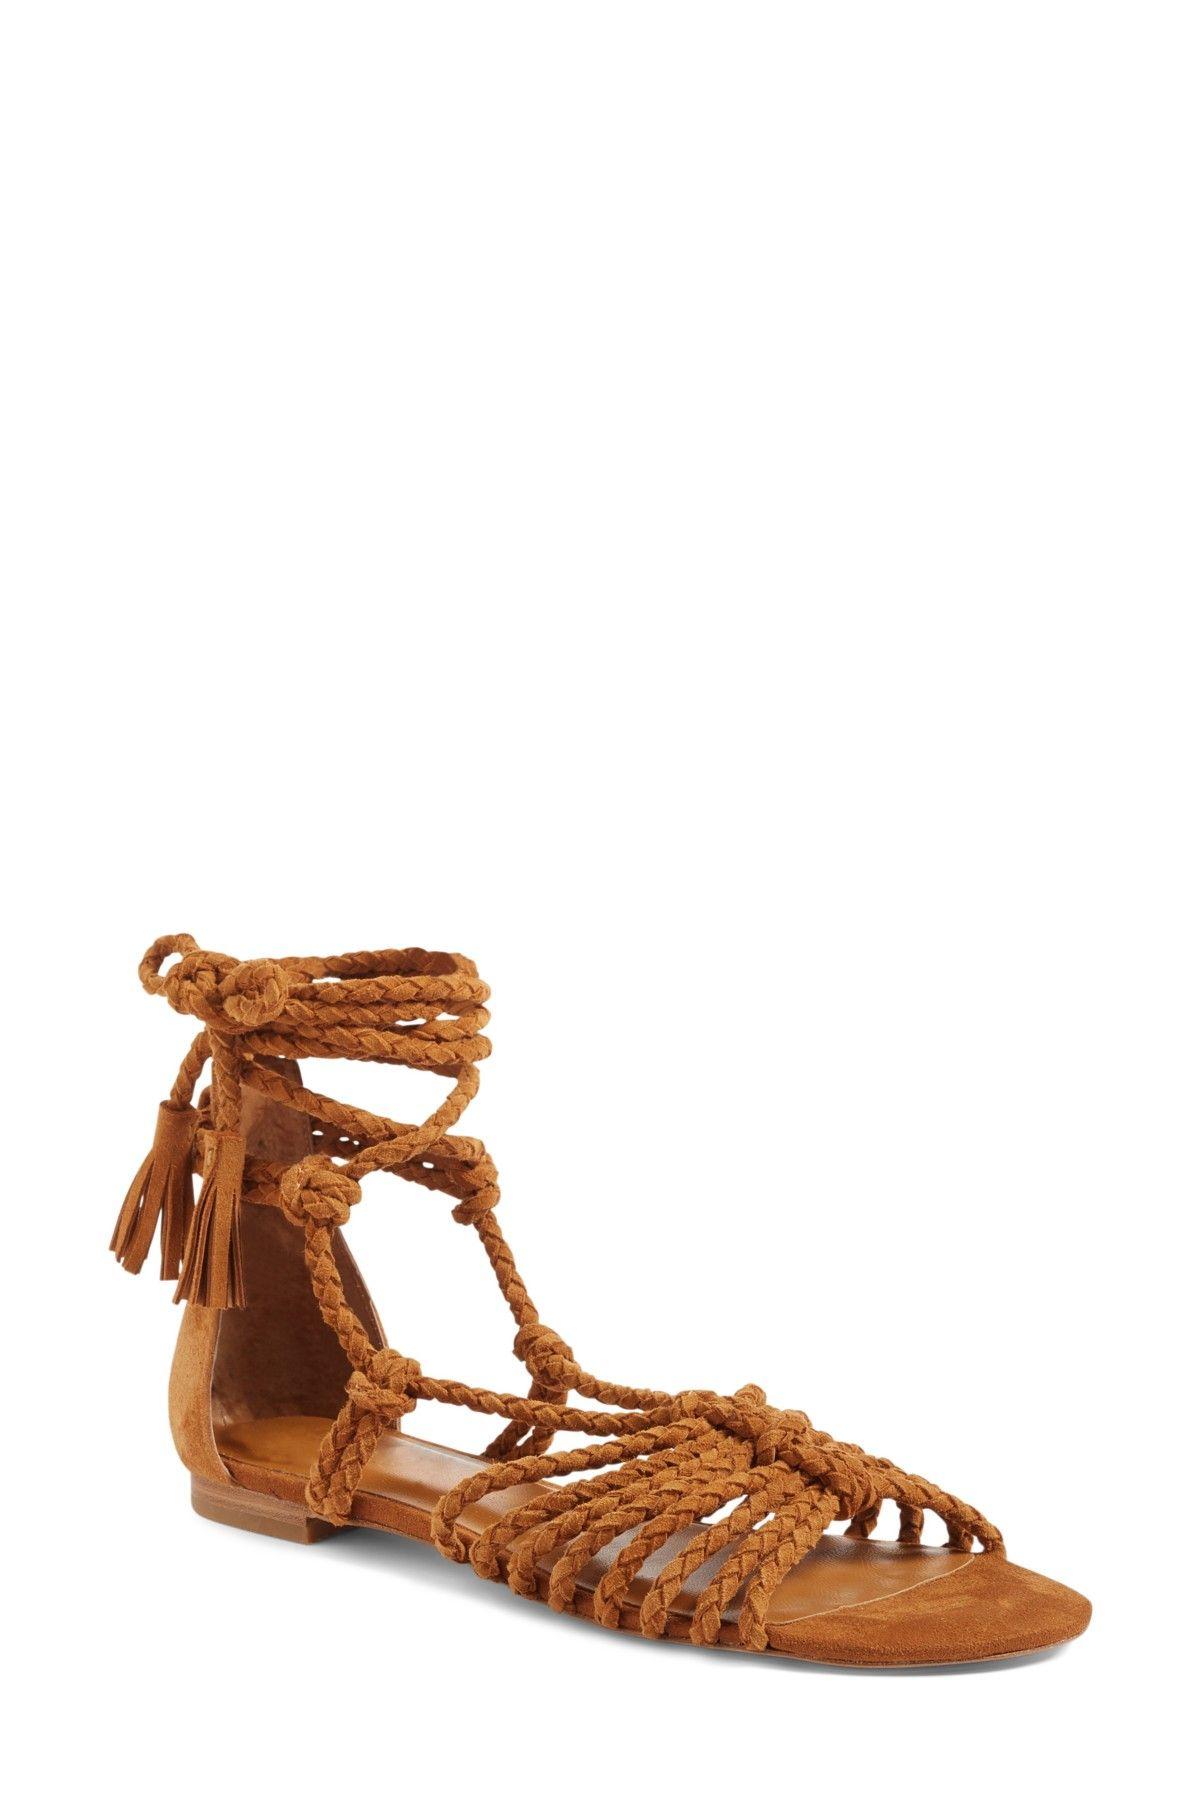 619fbb2bb4 Joie Falk Ankle Wrap Sandal   Products   Ankle wrap sandals, Sandals ...